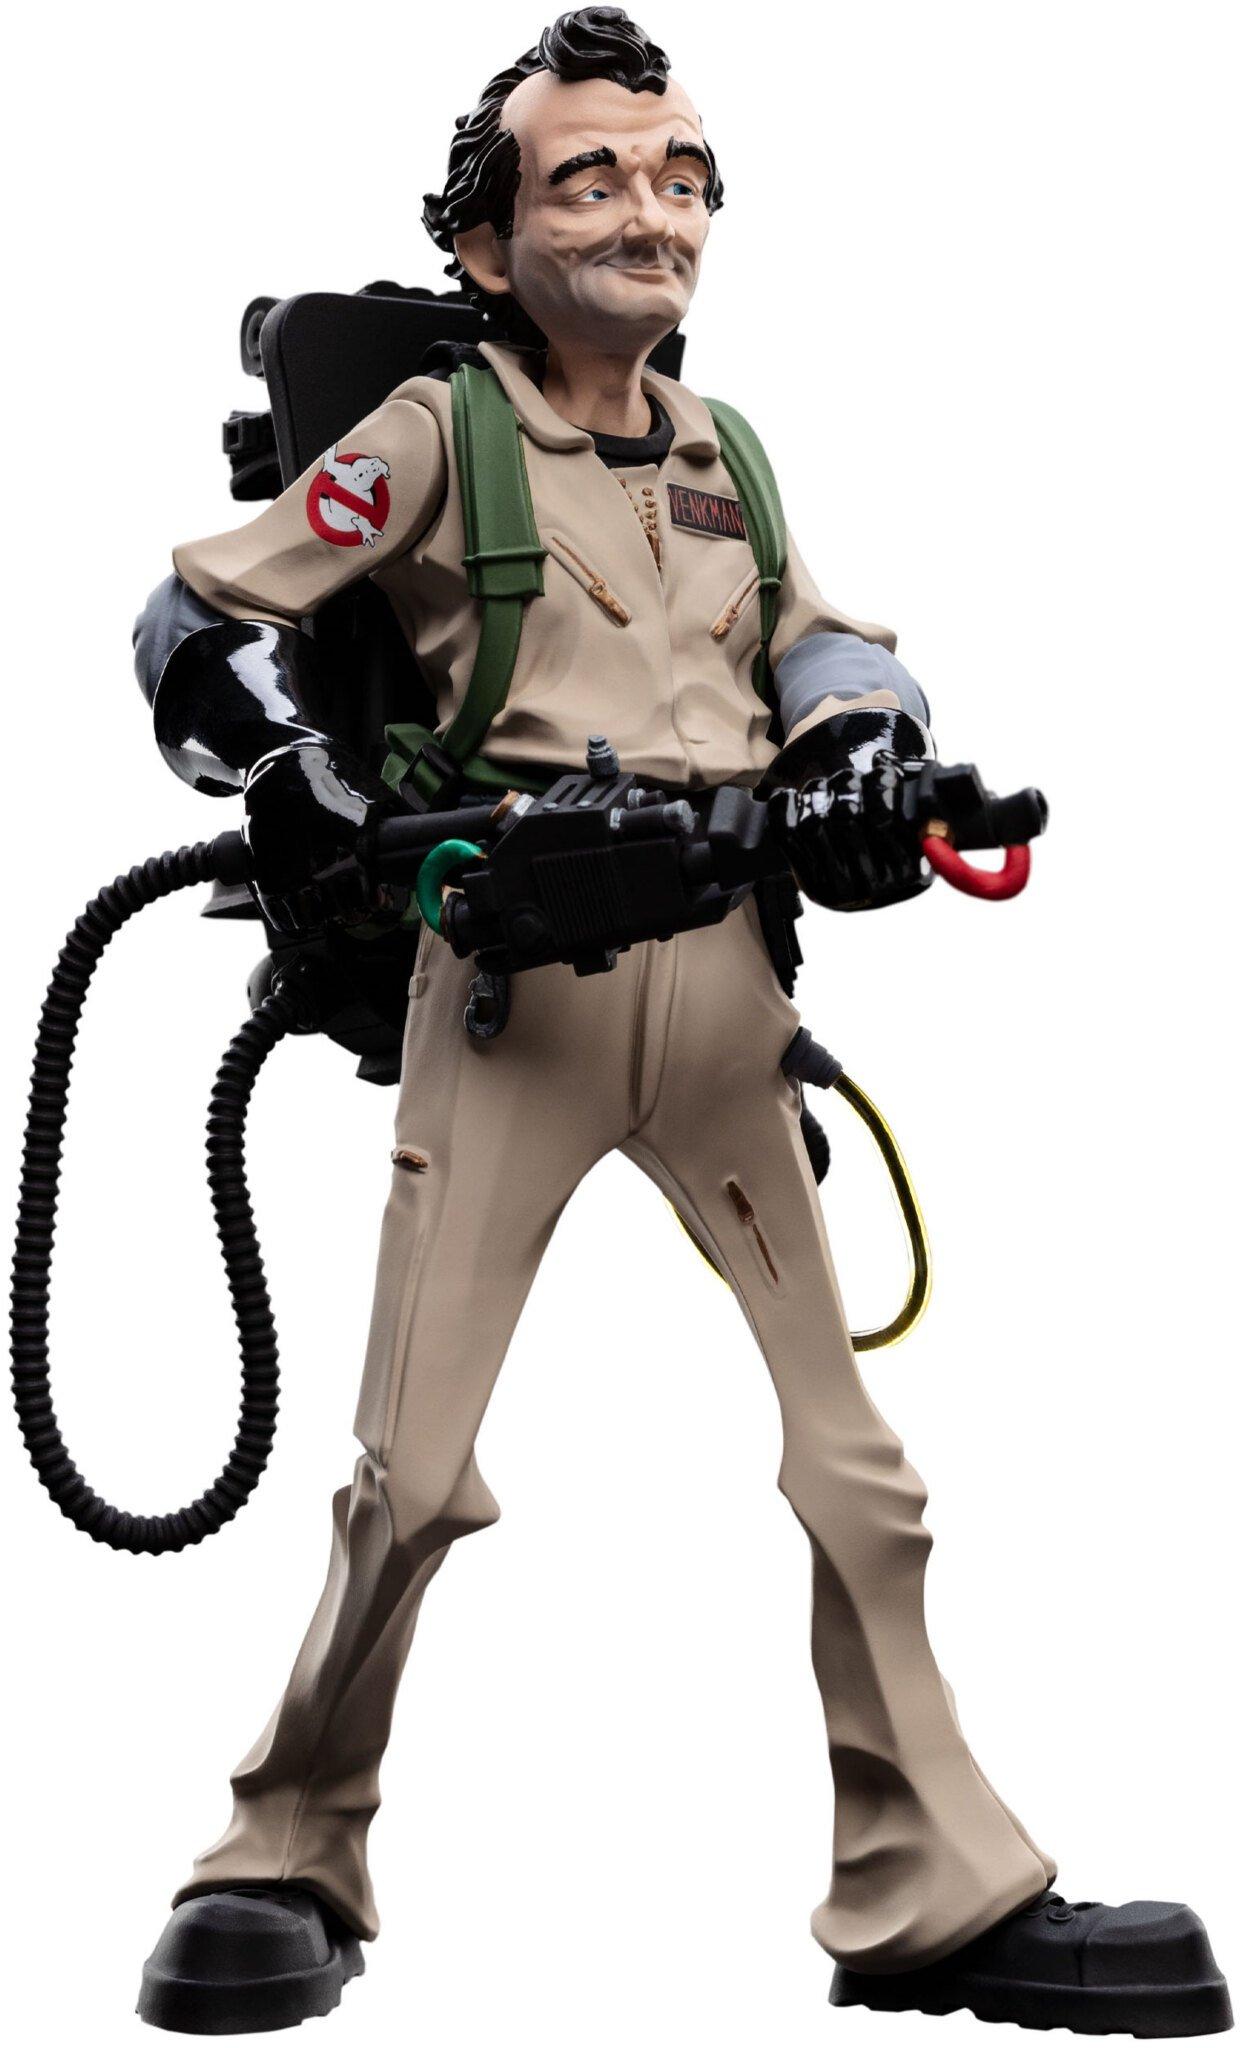 Ghostbusters Mini Epics - Peter Venkman